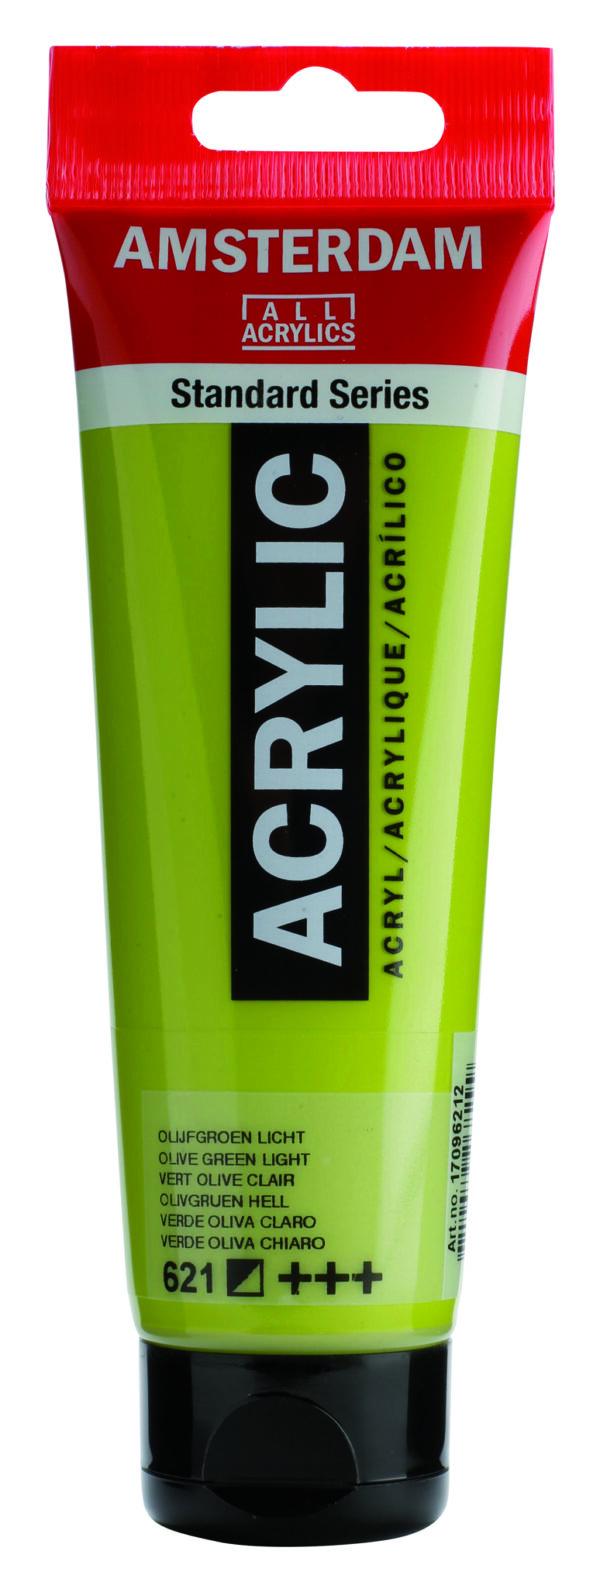 Ams std 621 Olive green Light - 120 ml